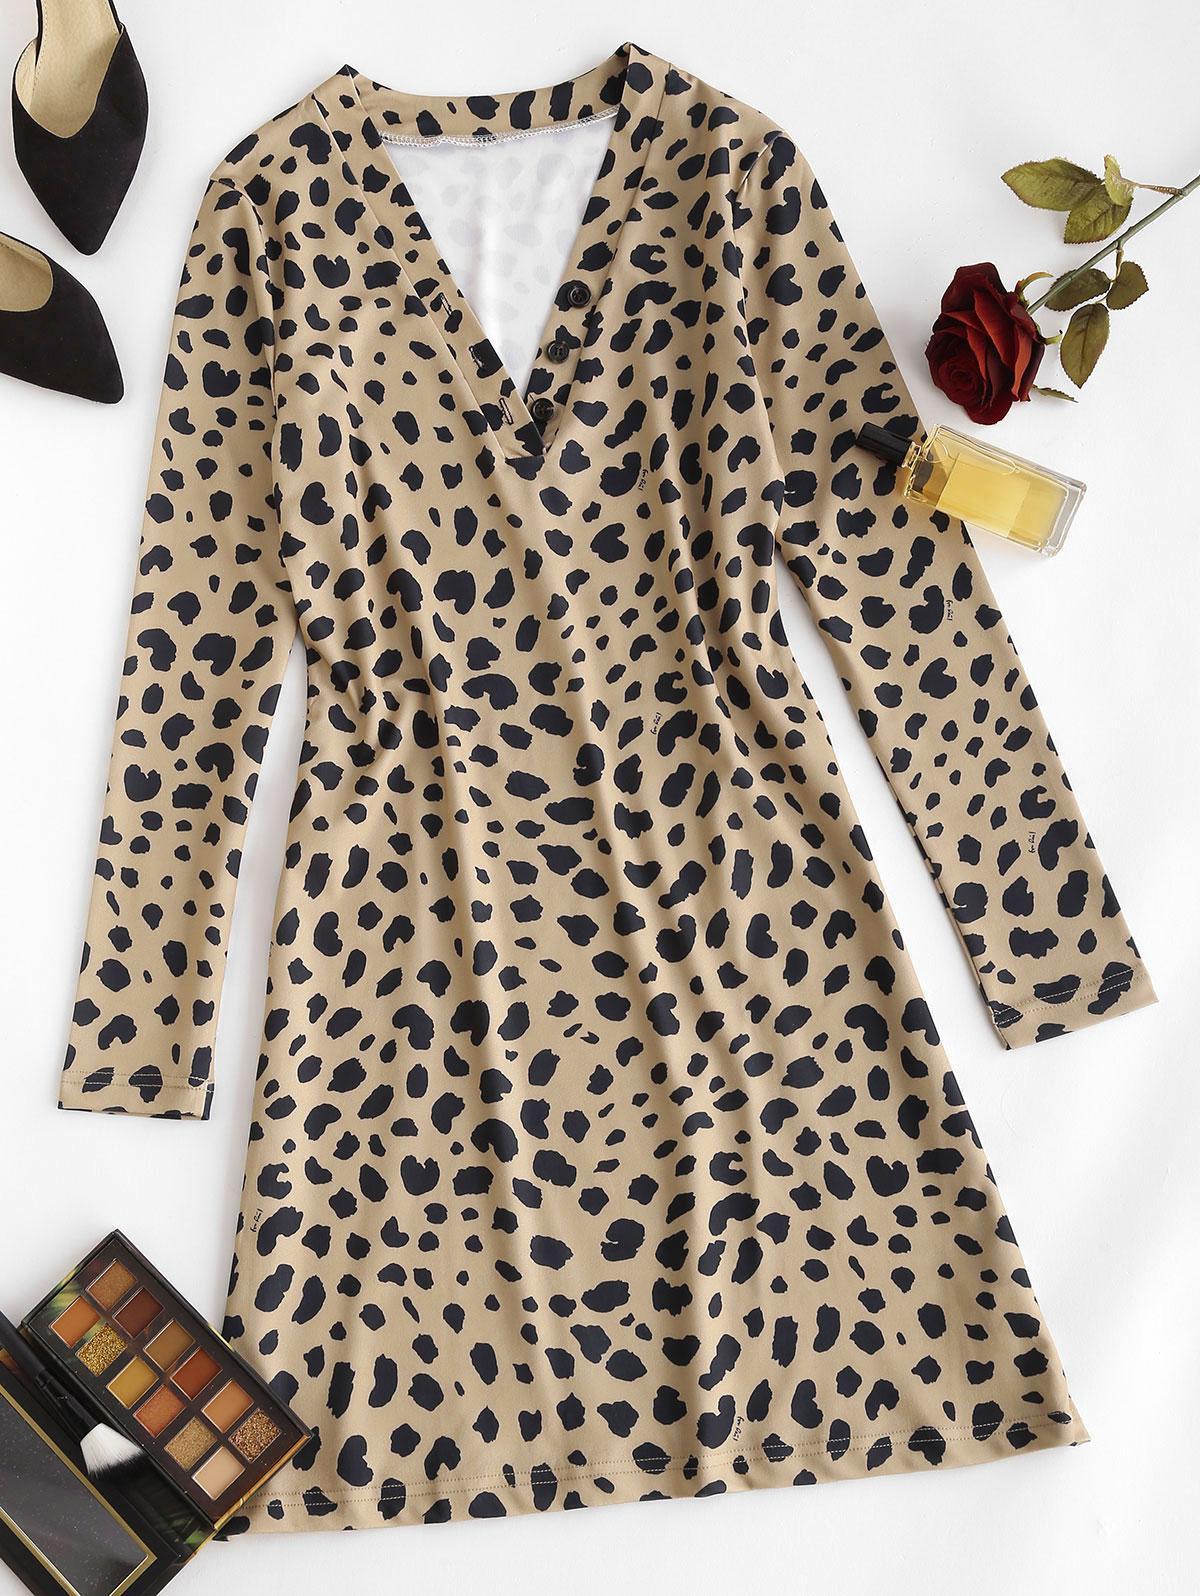 Leopard Animal Print Long Sleeve Tight Dress